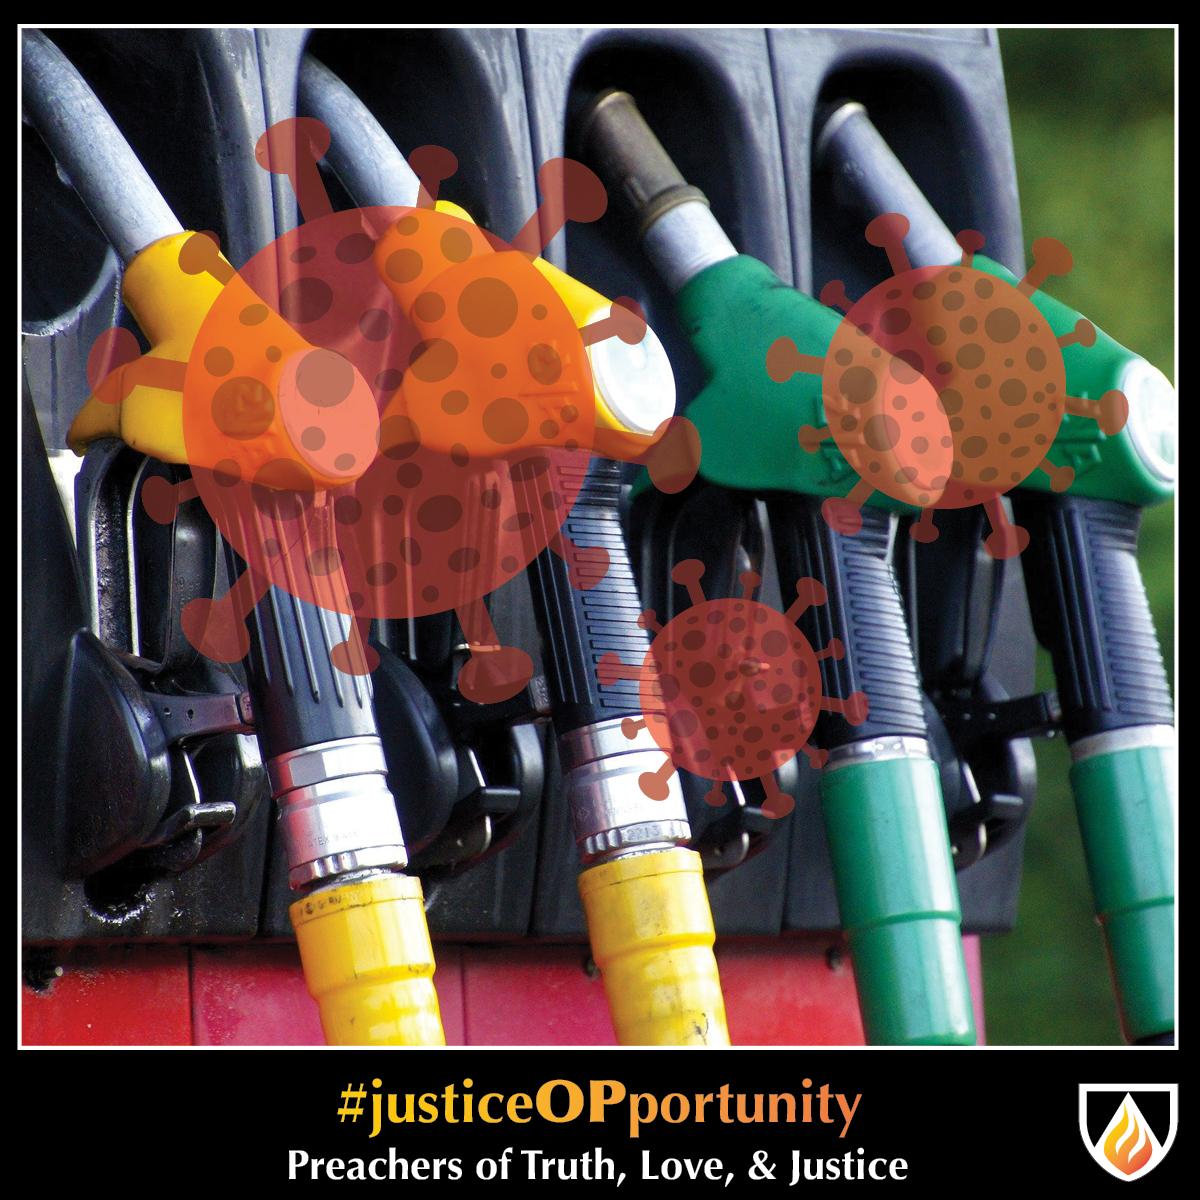 #justiceOPportunity Thursday—October 22, 2020